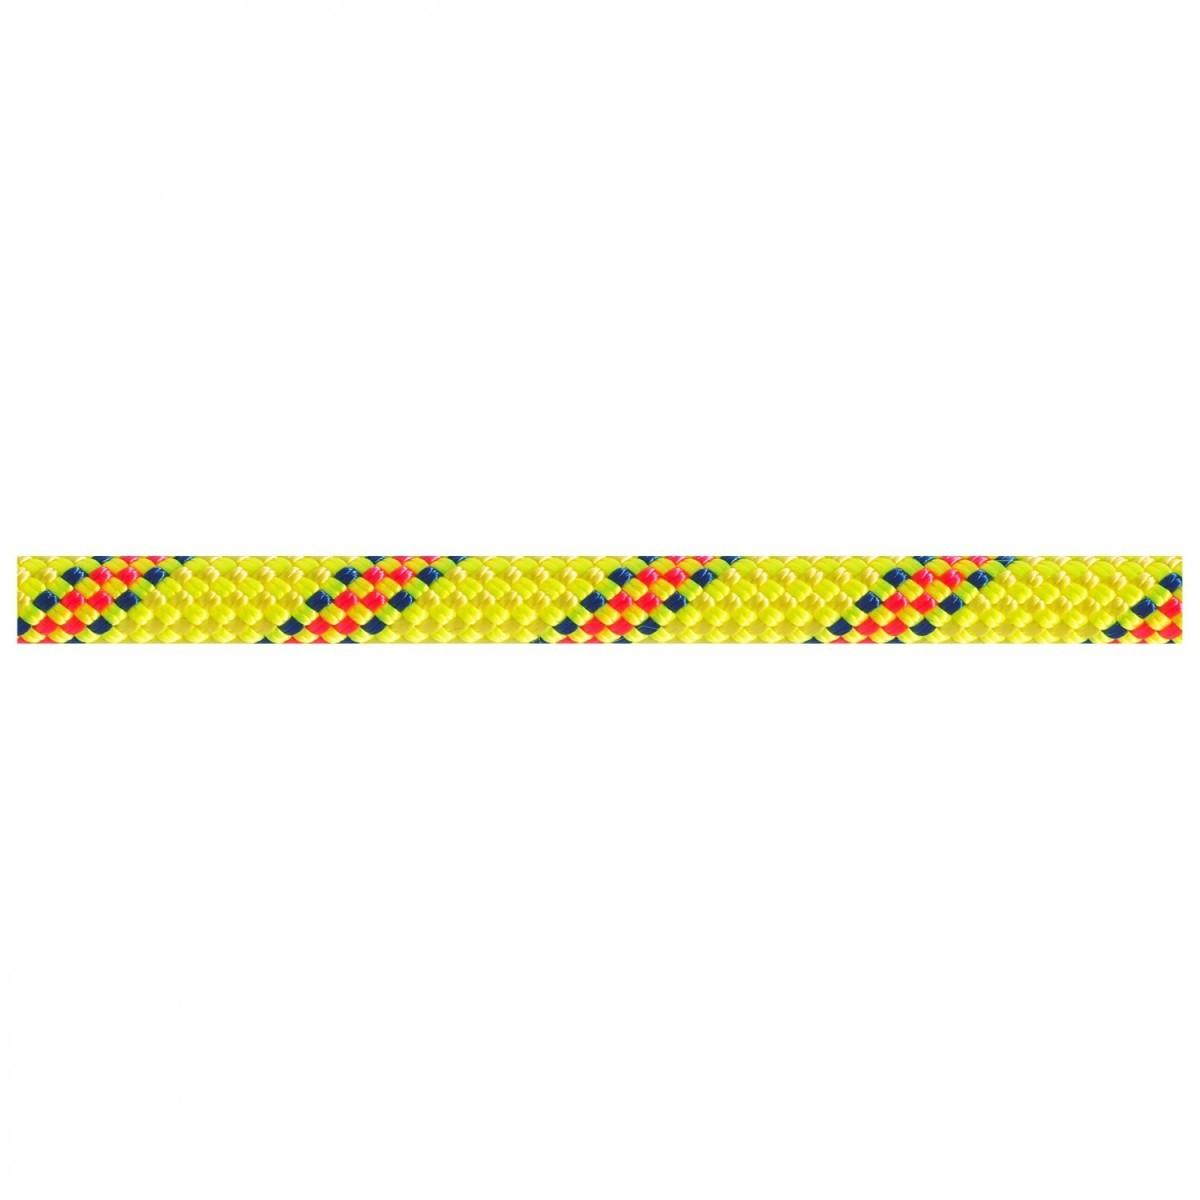 BEAL べアール Karma 9.8(80m - Yellow)★ロープ・ザイル・登山・クライミング★